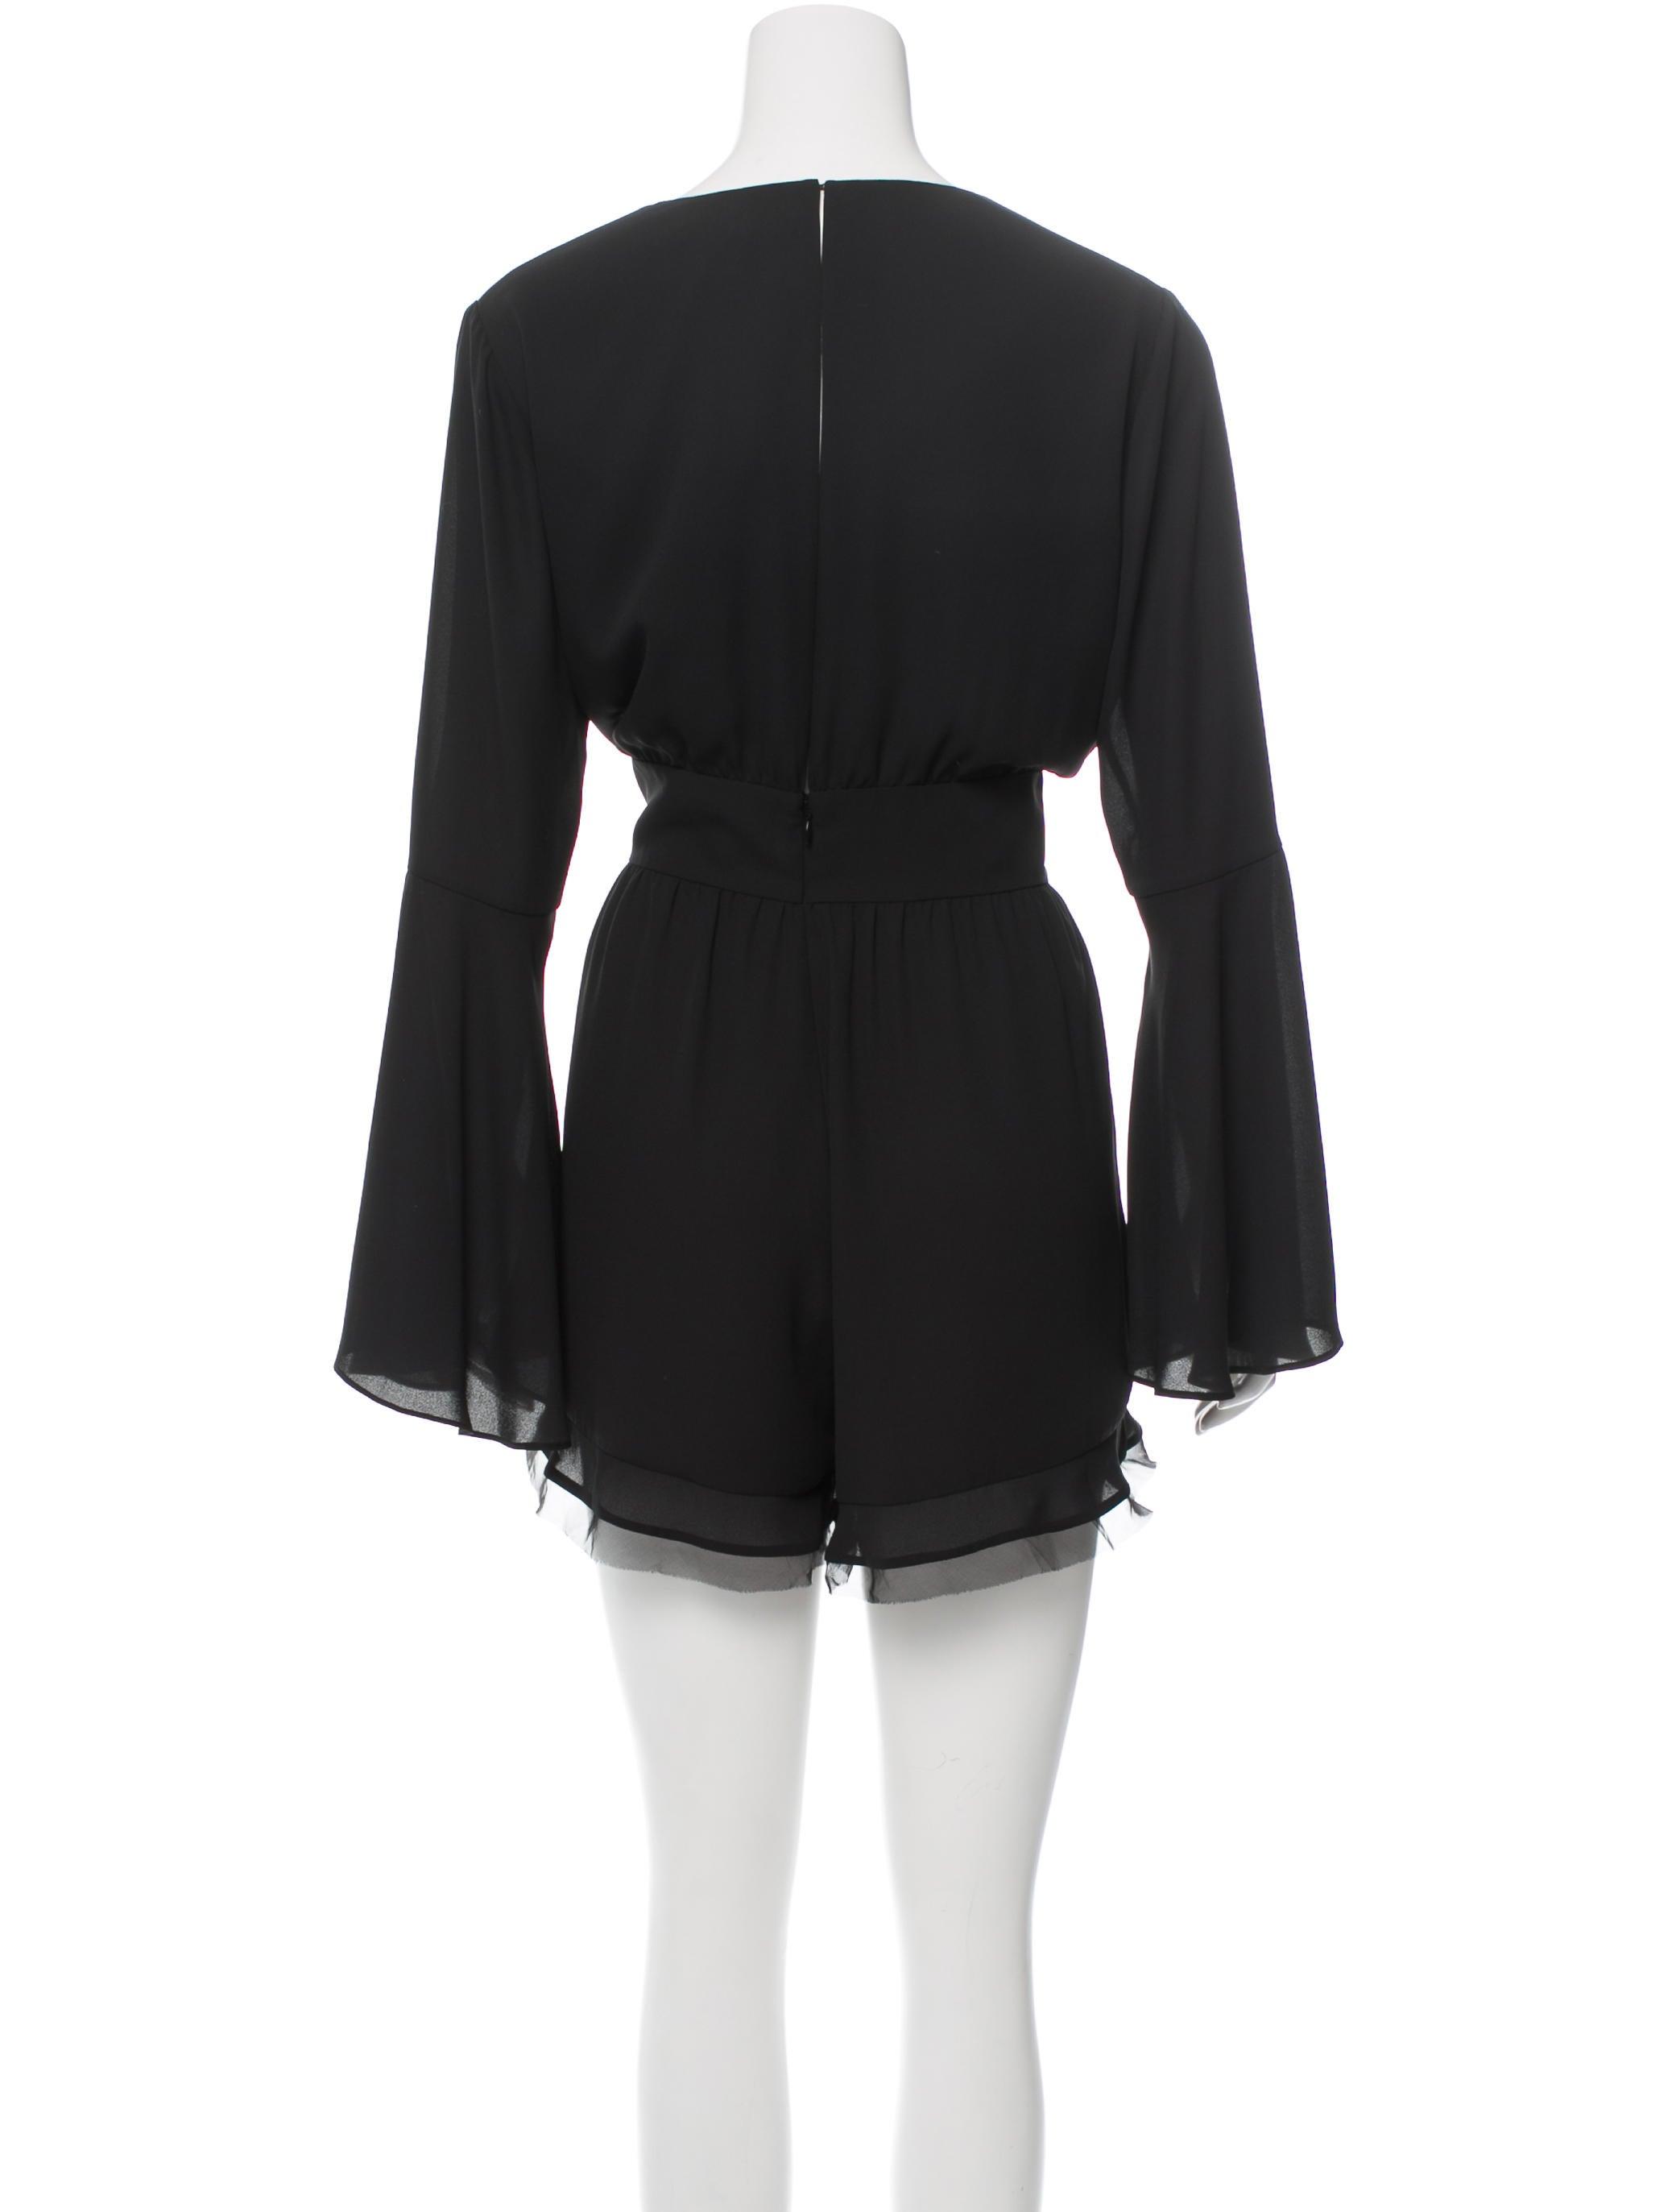 Two piece catalog Spaghetti Strap Backless Plain Sleeveless Bodycon Dresses lanka yellowknife xxs